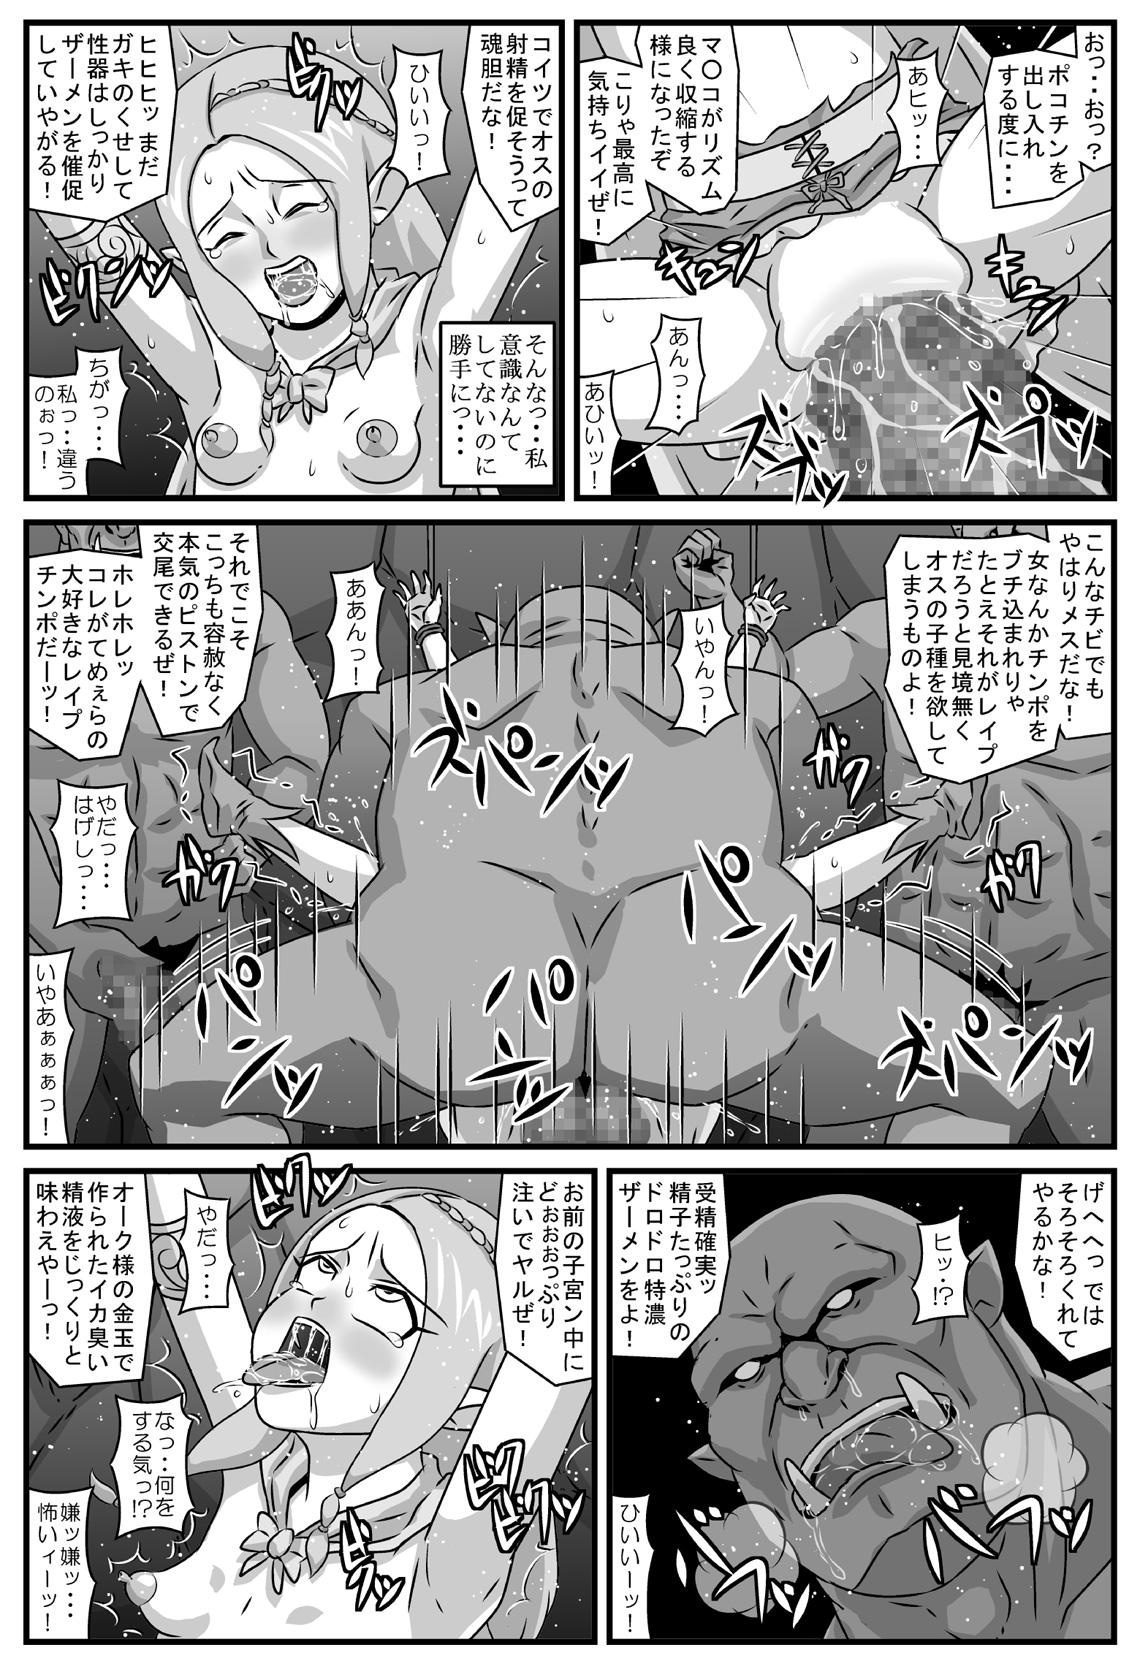 Elf Rinkan ~Kijin-tachi no Seien 8